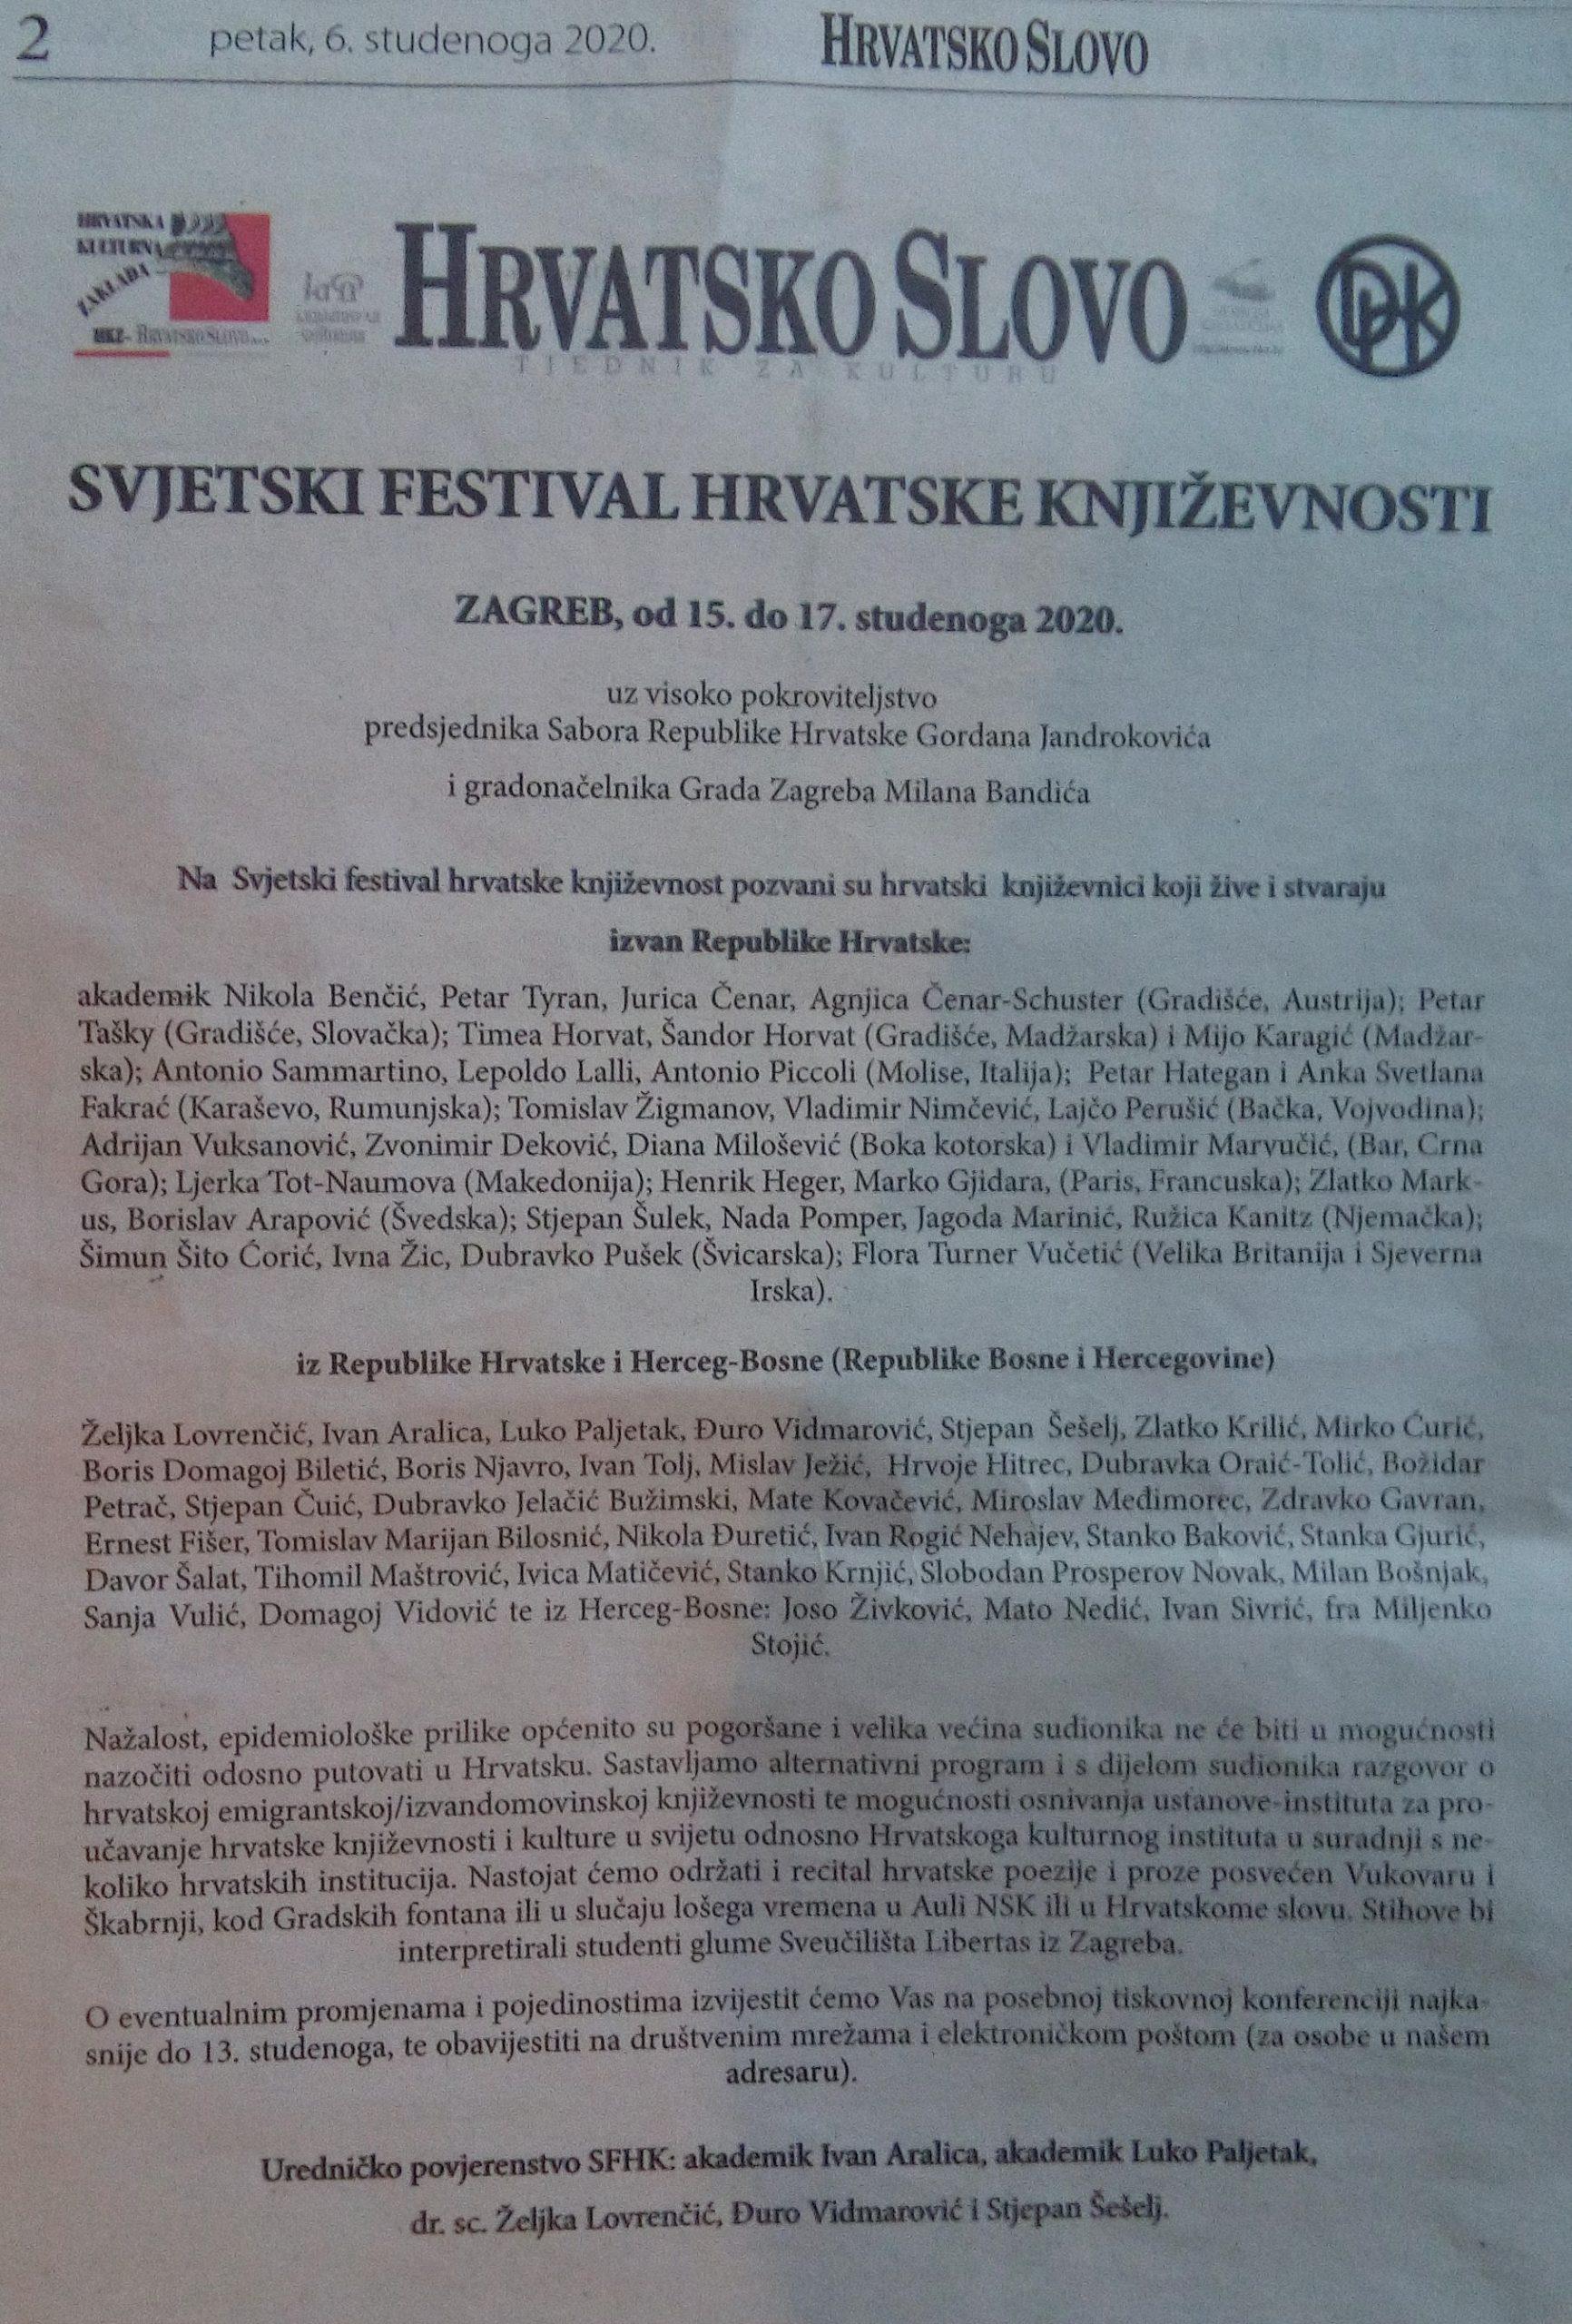 World Festival of Croatian Literature